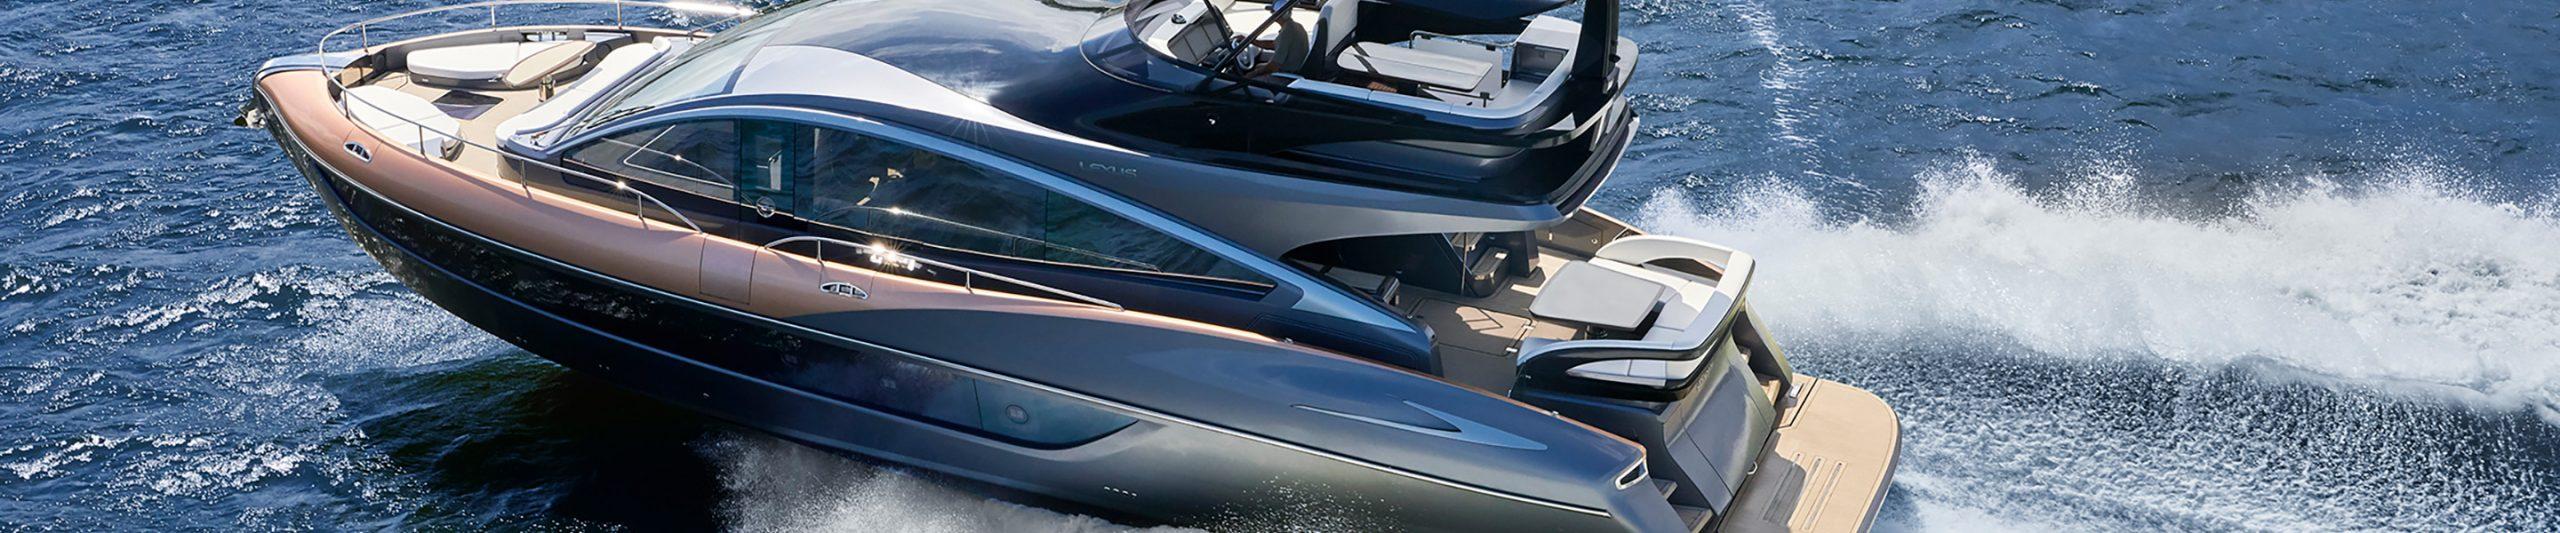 Motor Boats Gallery